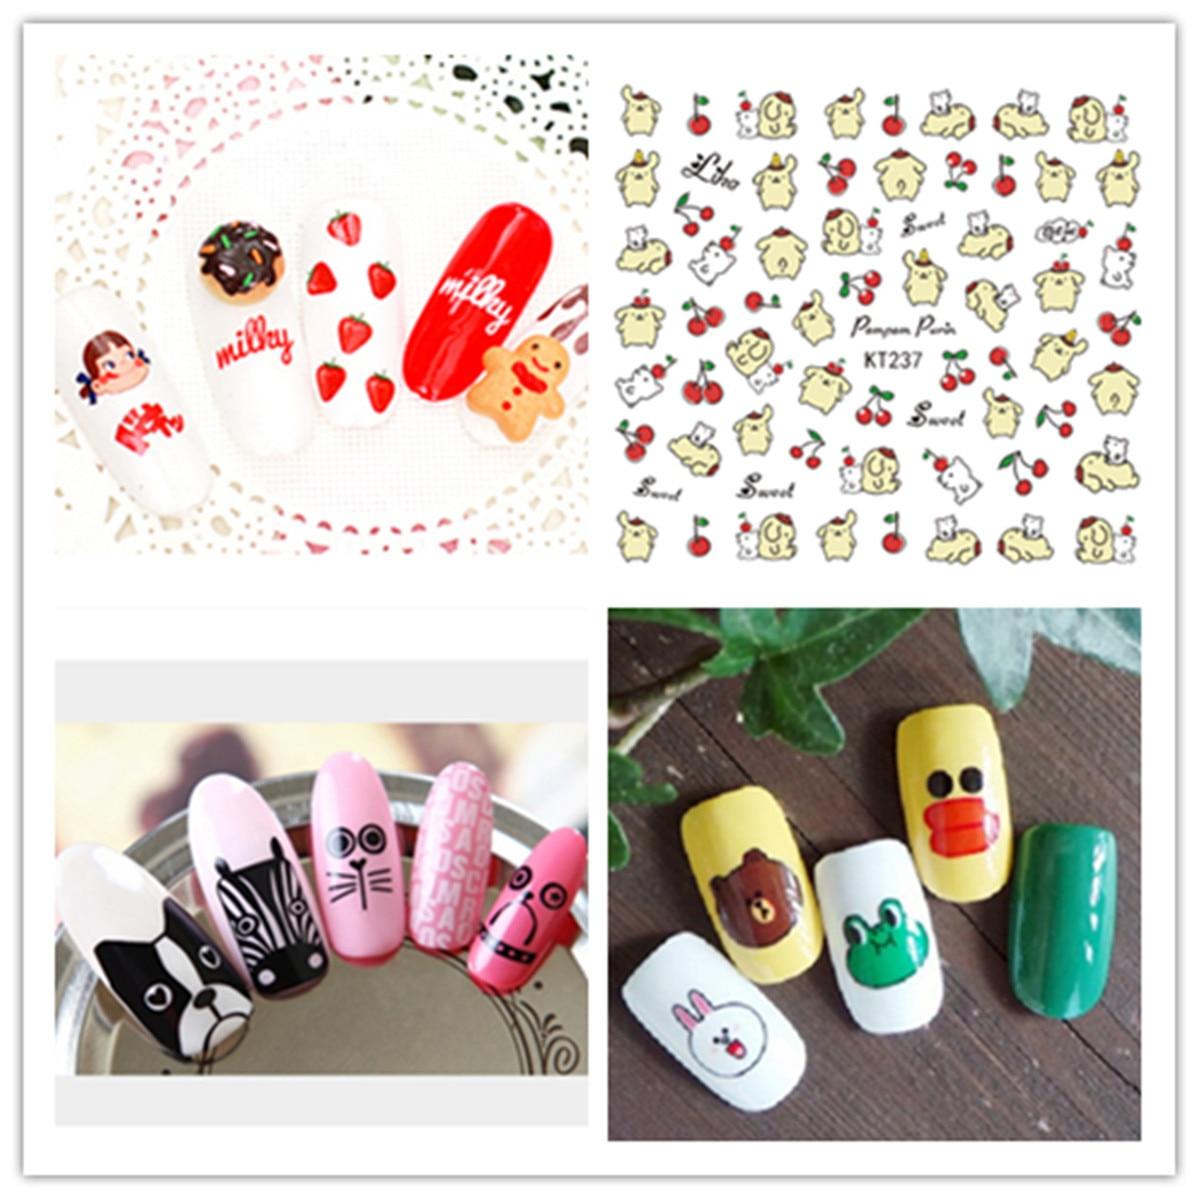 KT232-2533D Gum Environmentally Friendly Children Nail Sticker Series Nail Sticker 3D Nail Sticker Stationery Stickers